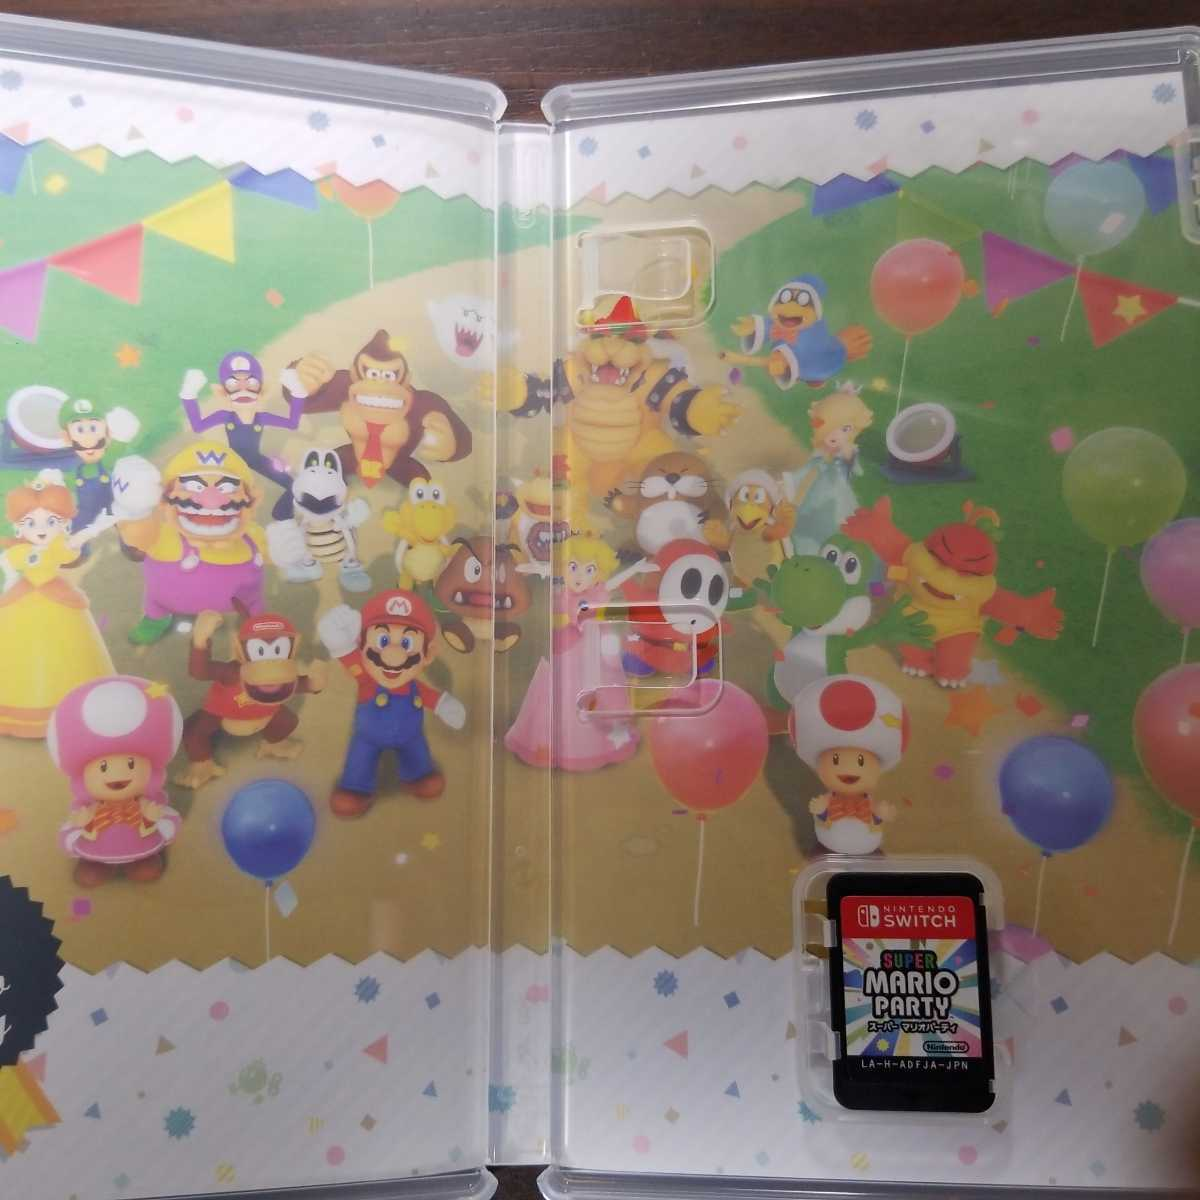 Switch スーパーマリオパーティ Nintendo Switch スーパーマリオ パーティ ニンテンドースイッチ 送料無料